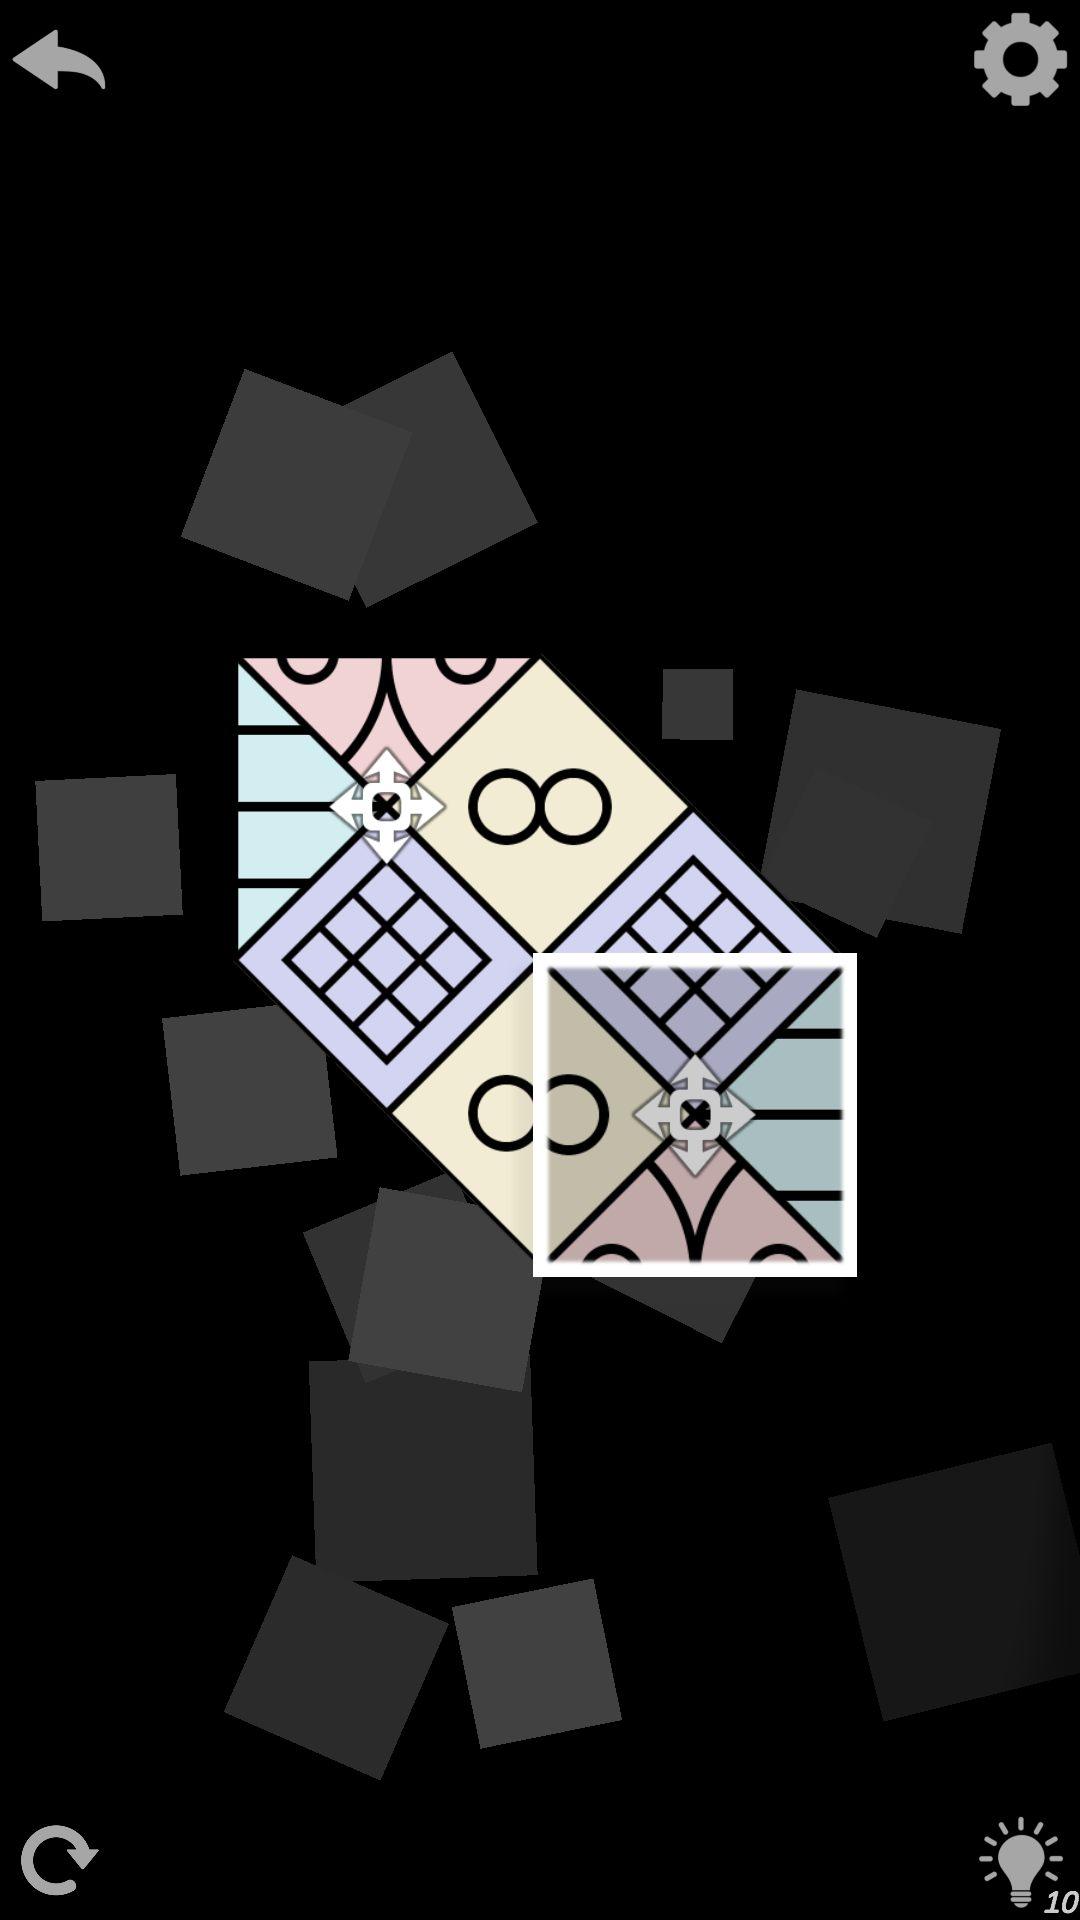 2 уровень AuroraBound - игра с узорами